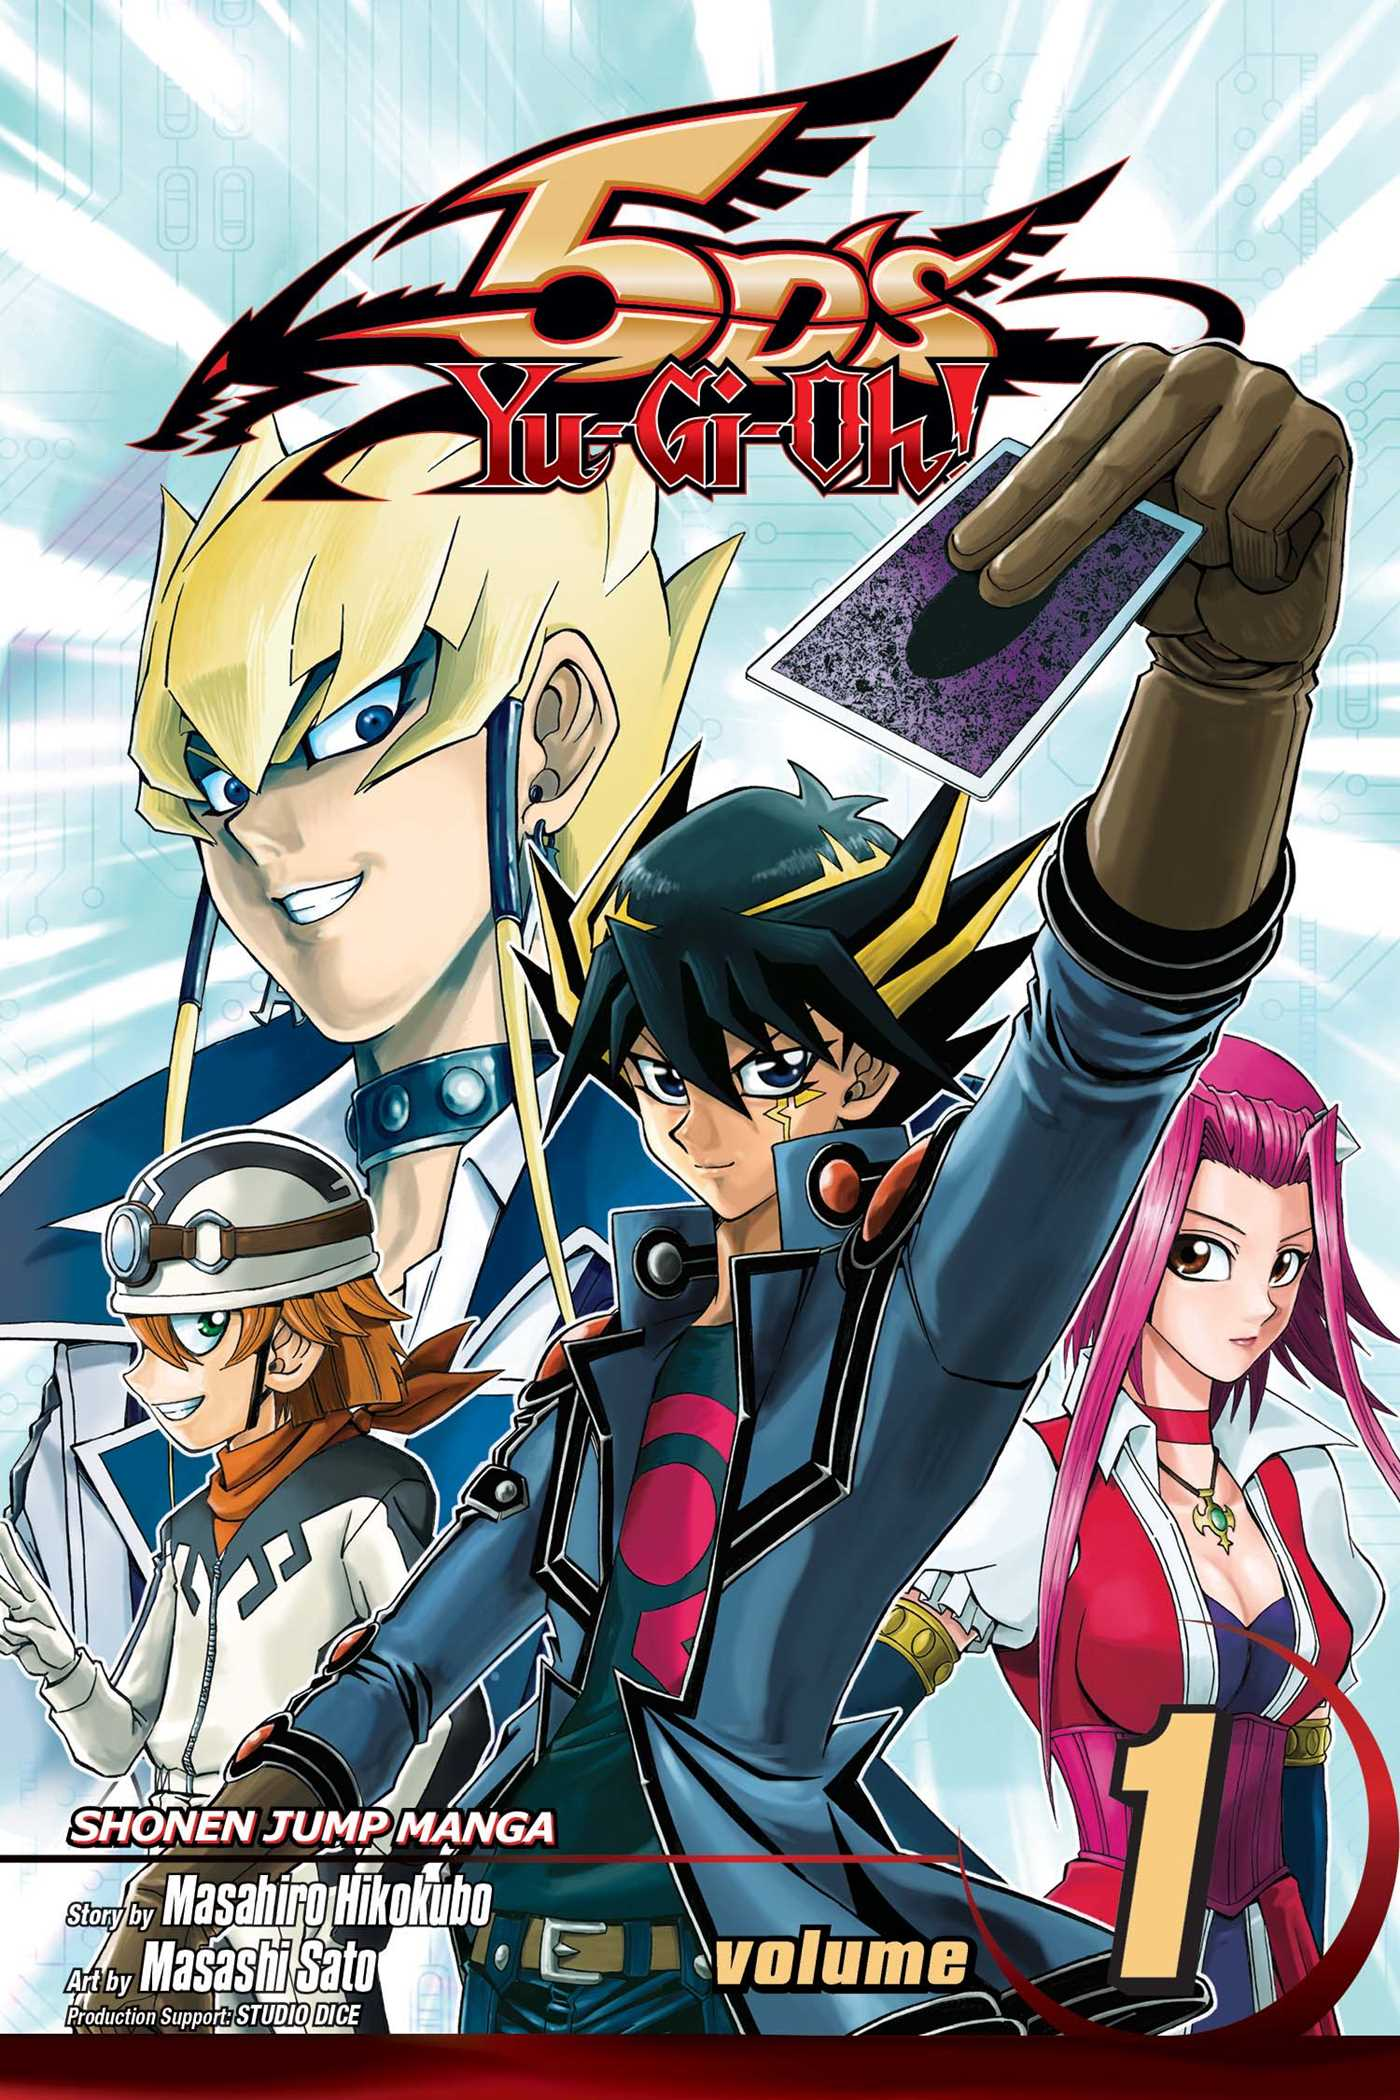 Yu-Gi-Oh! 5D's, Vol  1 | Book by Masahiro Hikokubo, Masashi Sato